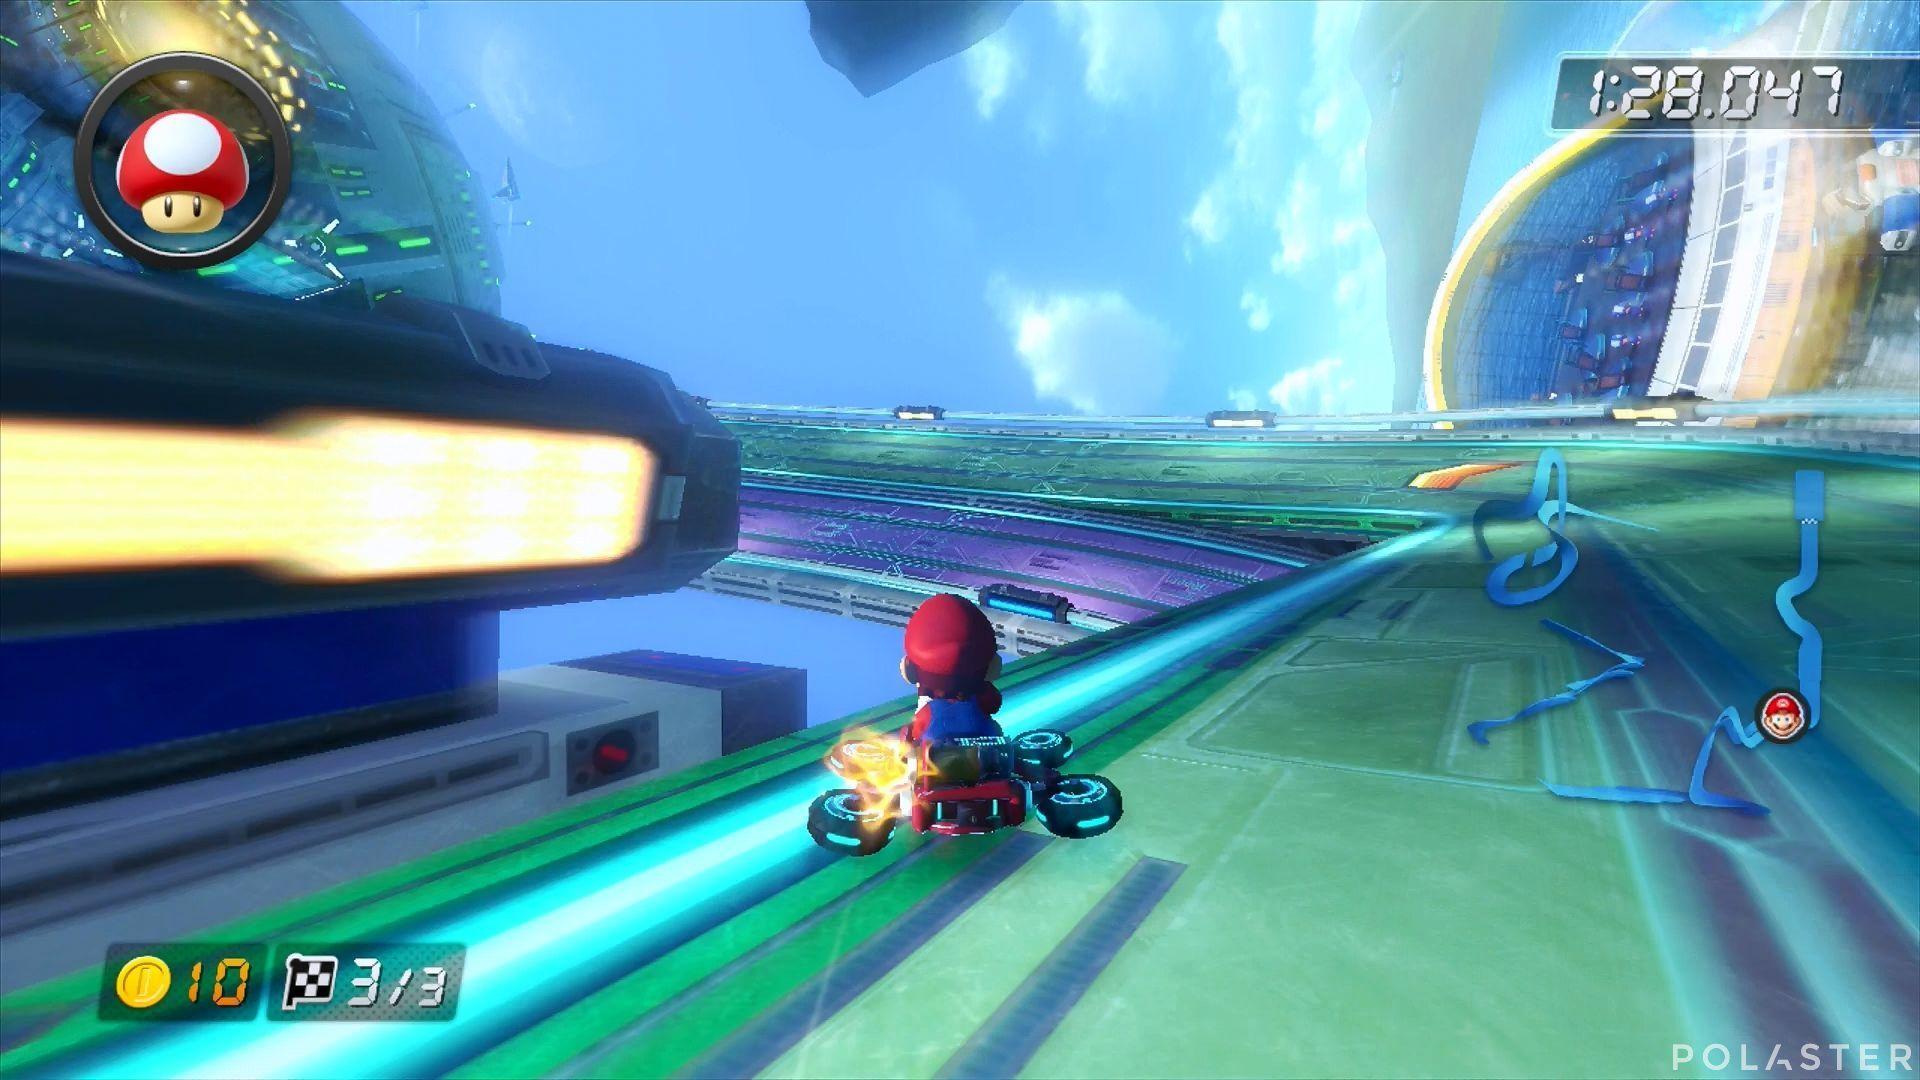 Mario Kart 8 - Big Blue